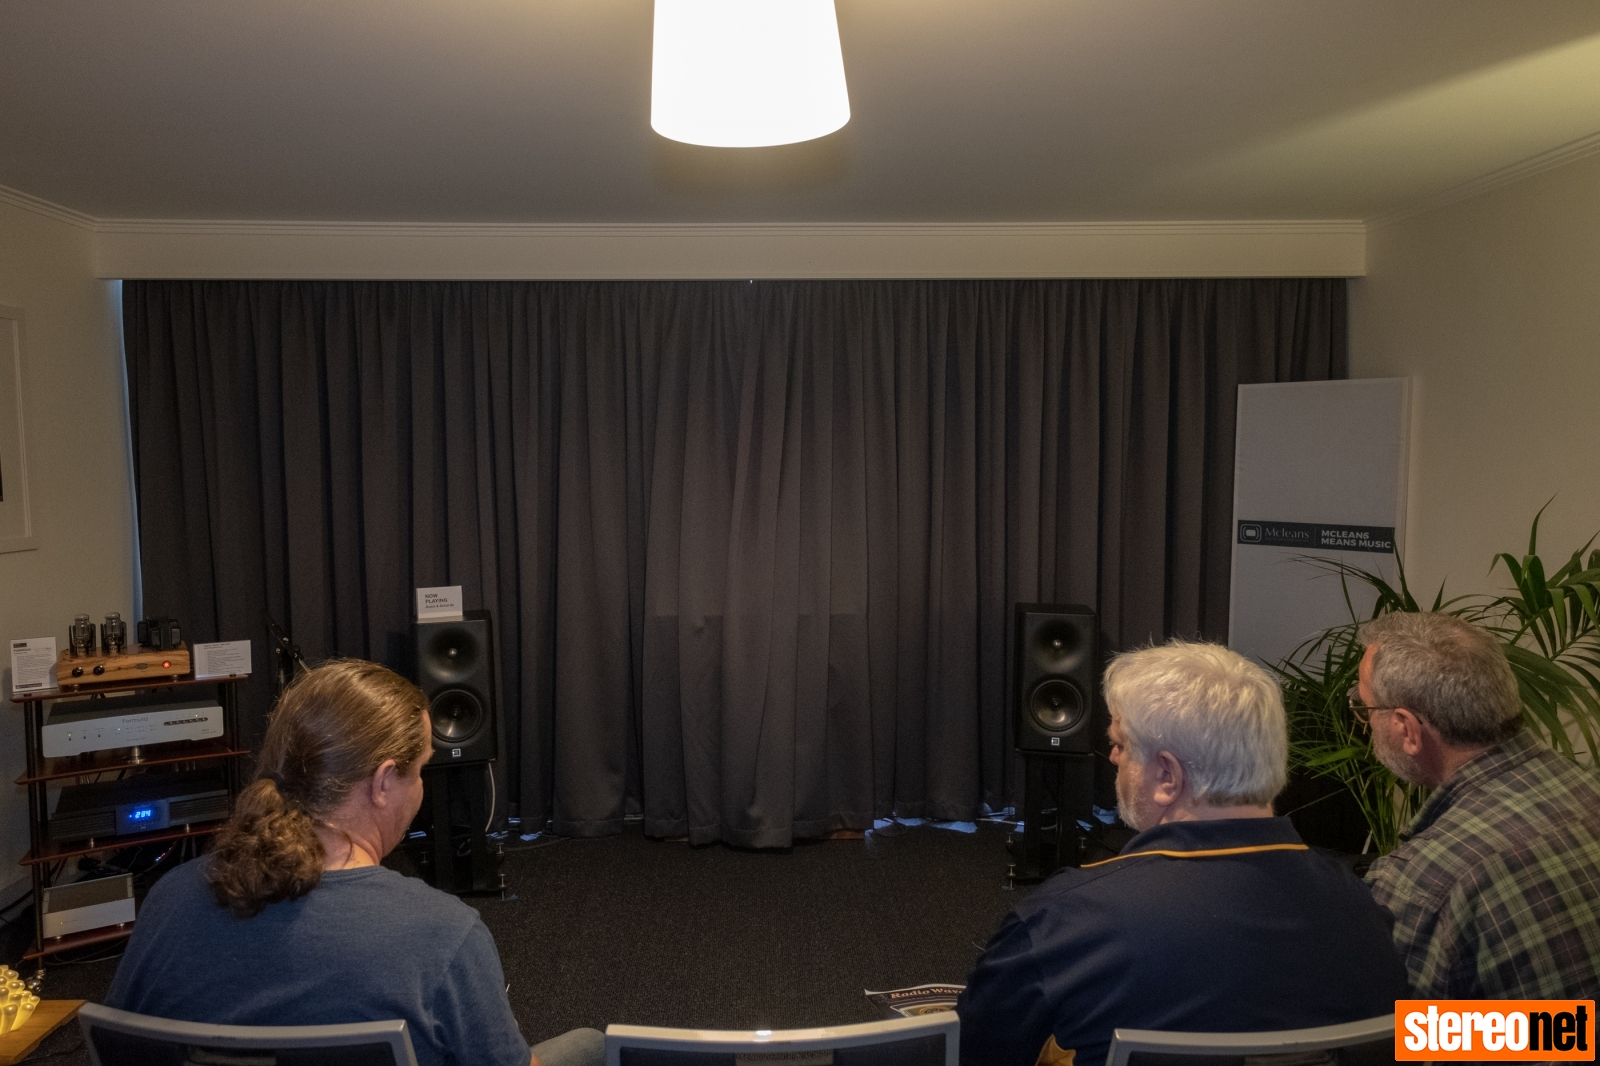 2018 Melbourne International Hi-Fi Show Coverage & Gallery